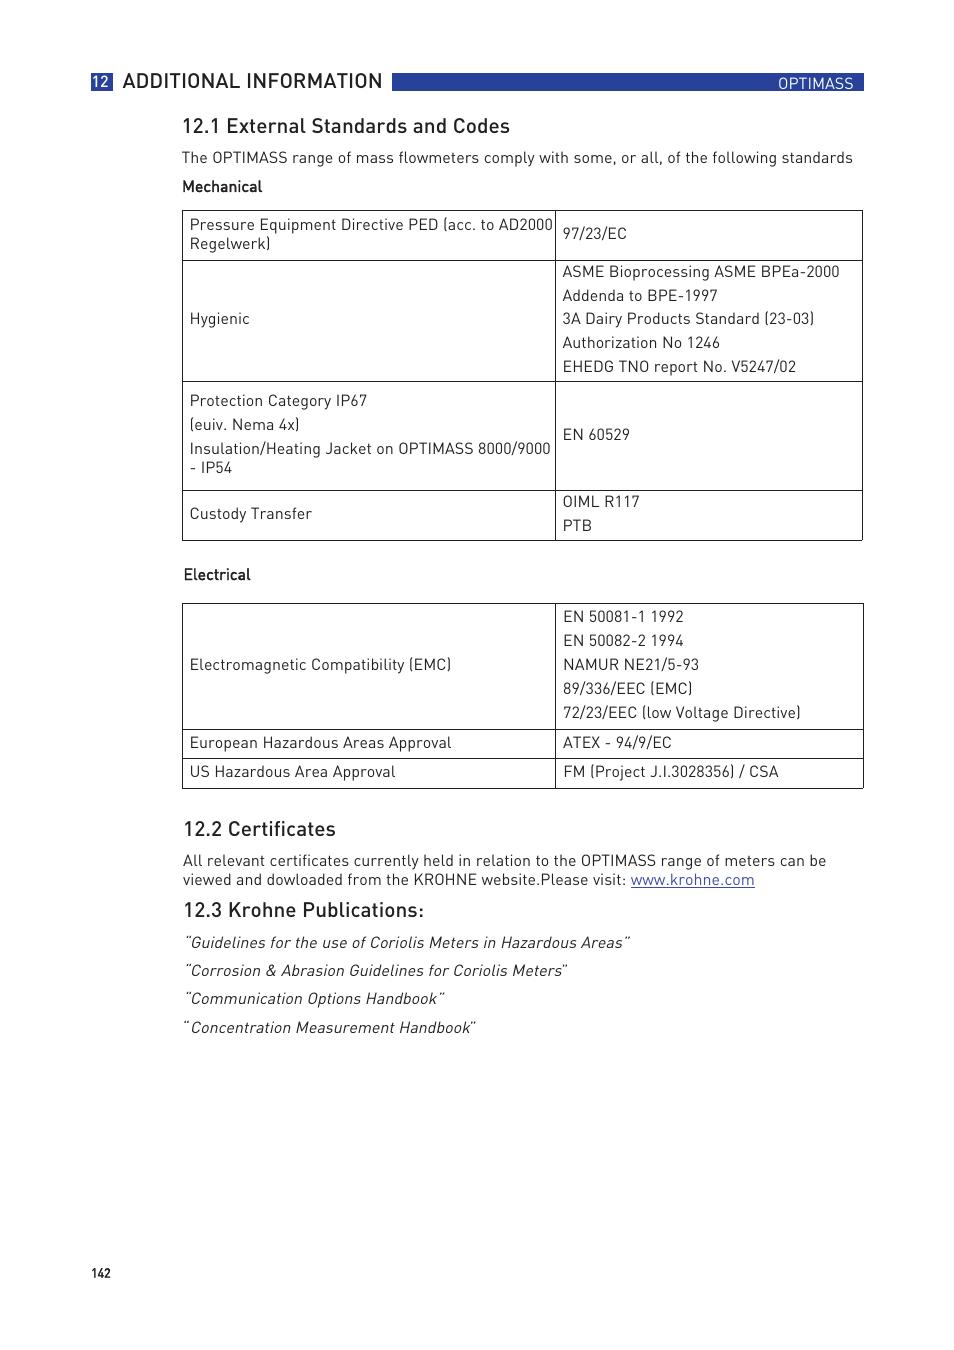 2 certificates, 3 krohne publications | KROHNE OPTIMASS with